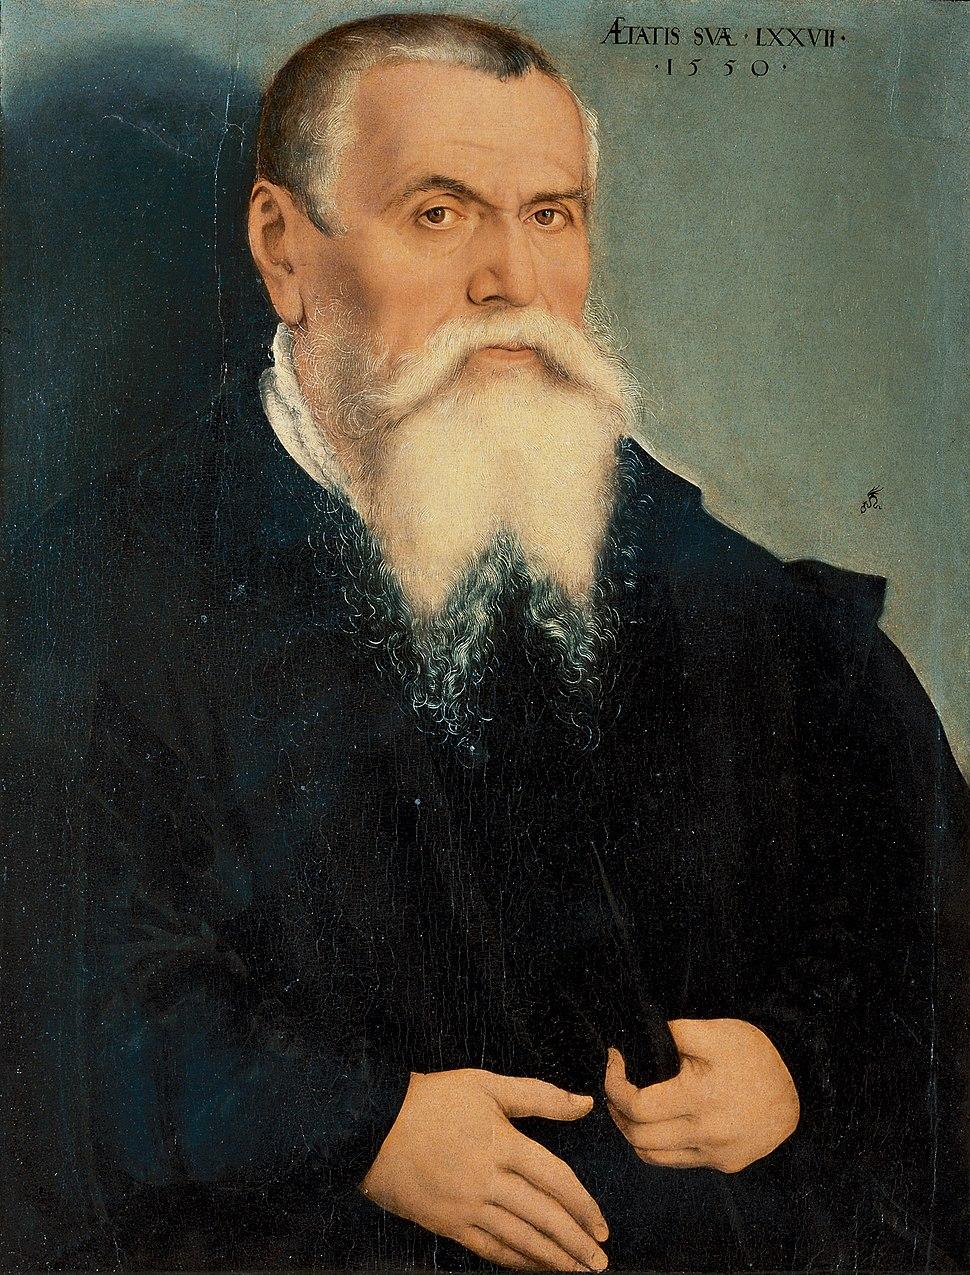 Lucas Cranach d. %C3%84. 063